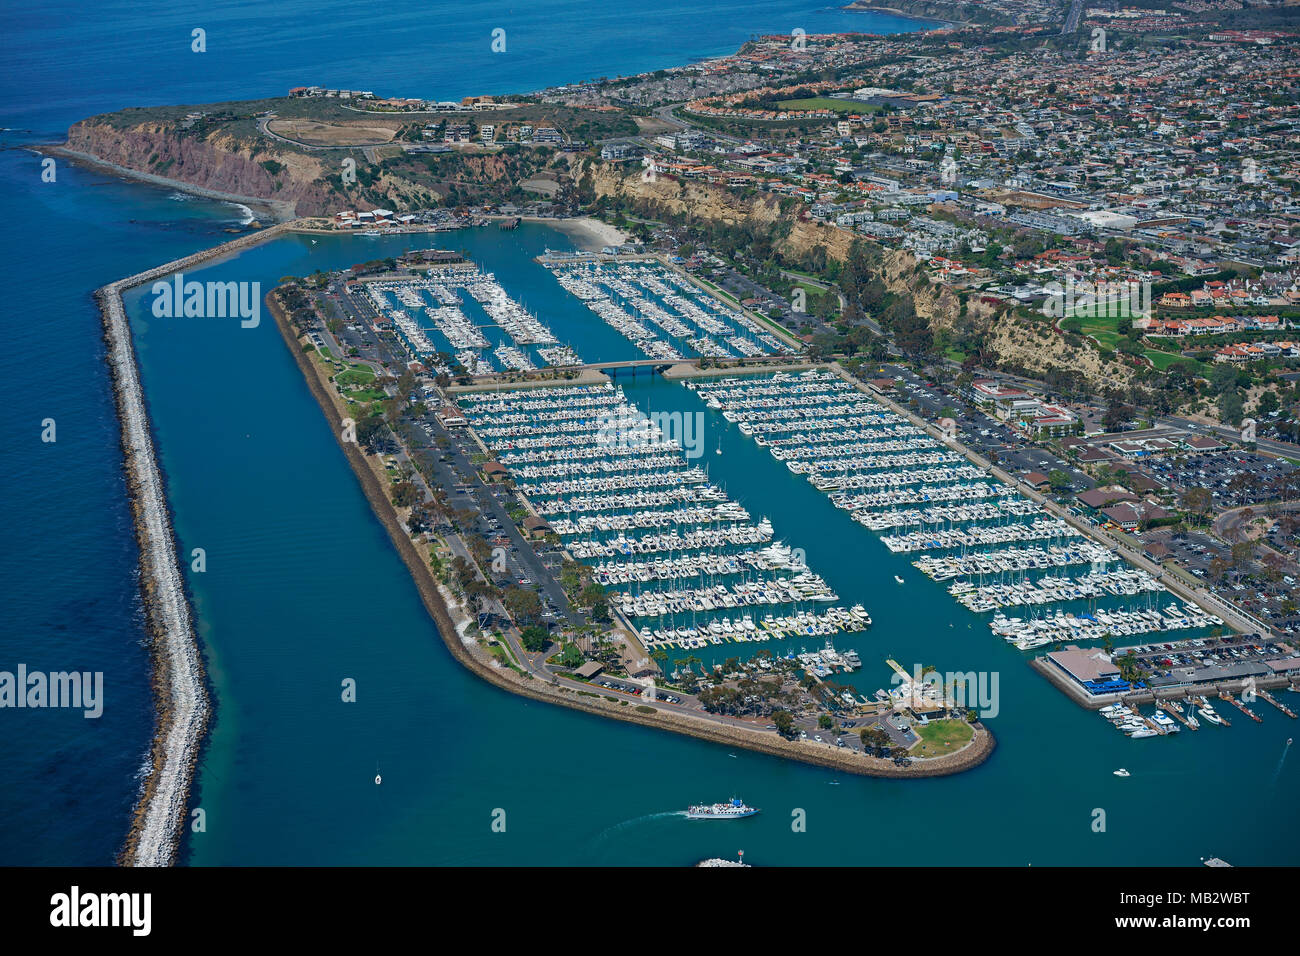 MARINA OF DANA POINT (aerial view). Orange County, California, USA. - Stock Image